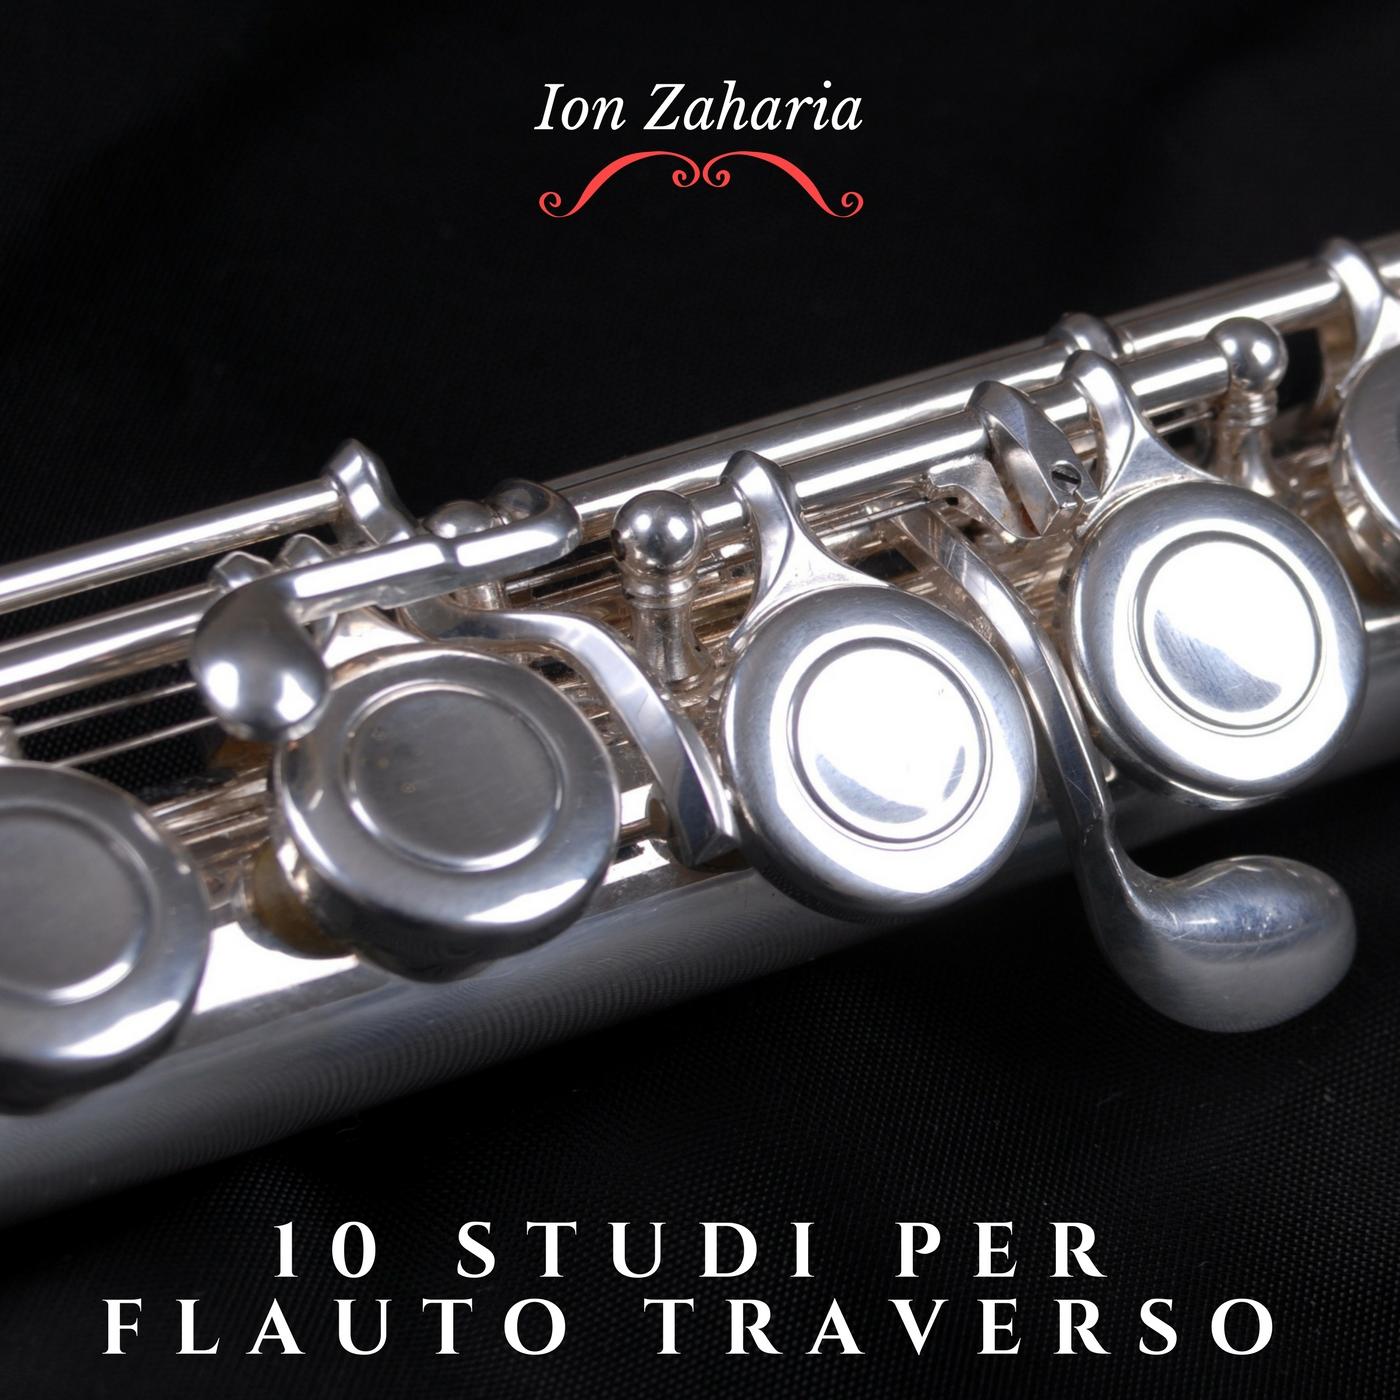 10 Studi per Flauto Traverso